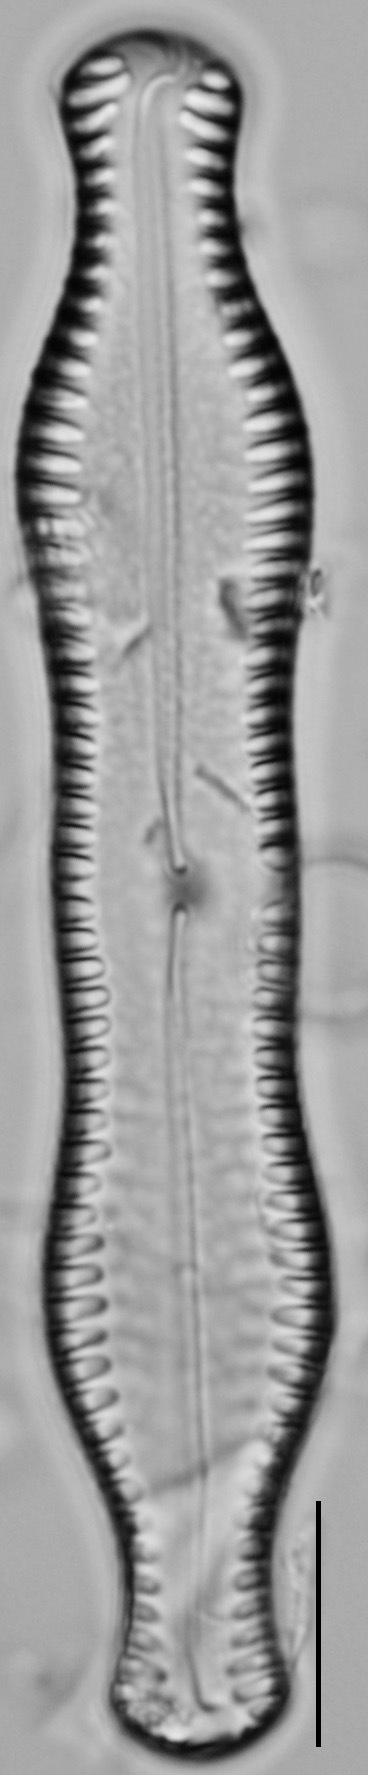 Pinnularia scotica LM3